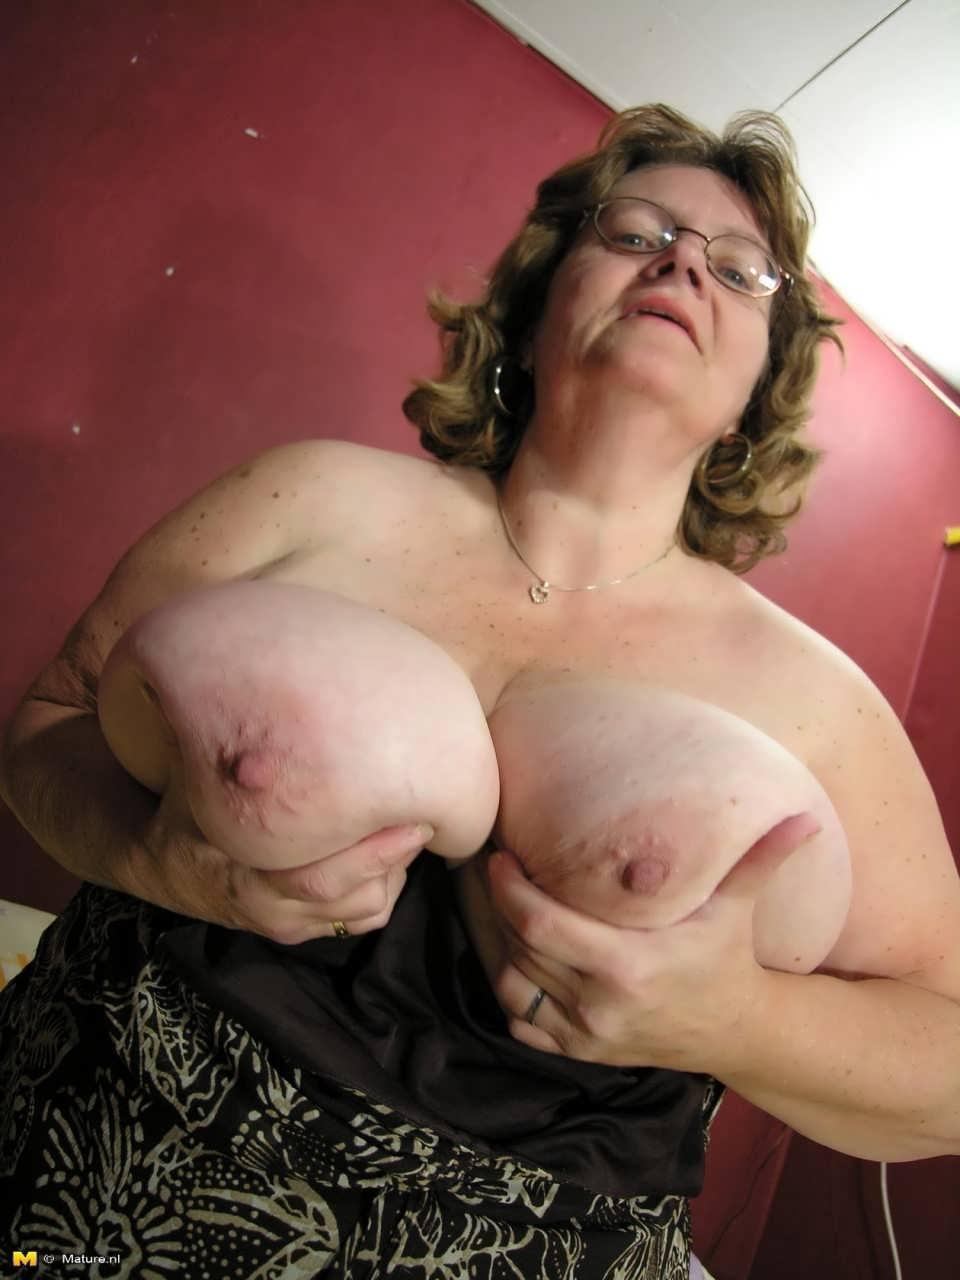 Фото бабушки с большими сиськами 8 фотография